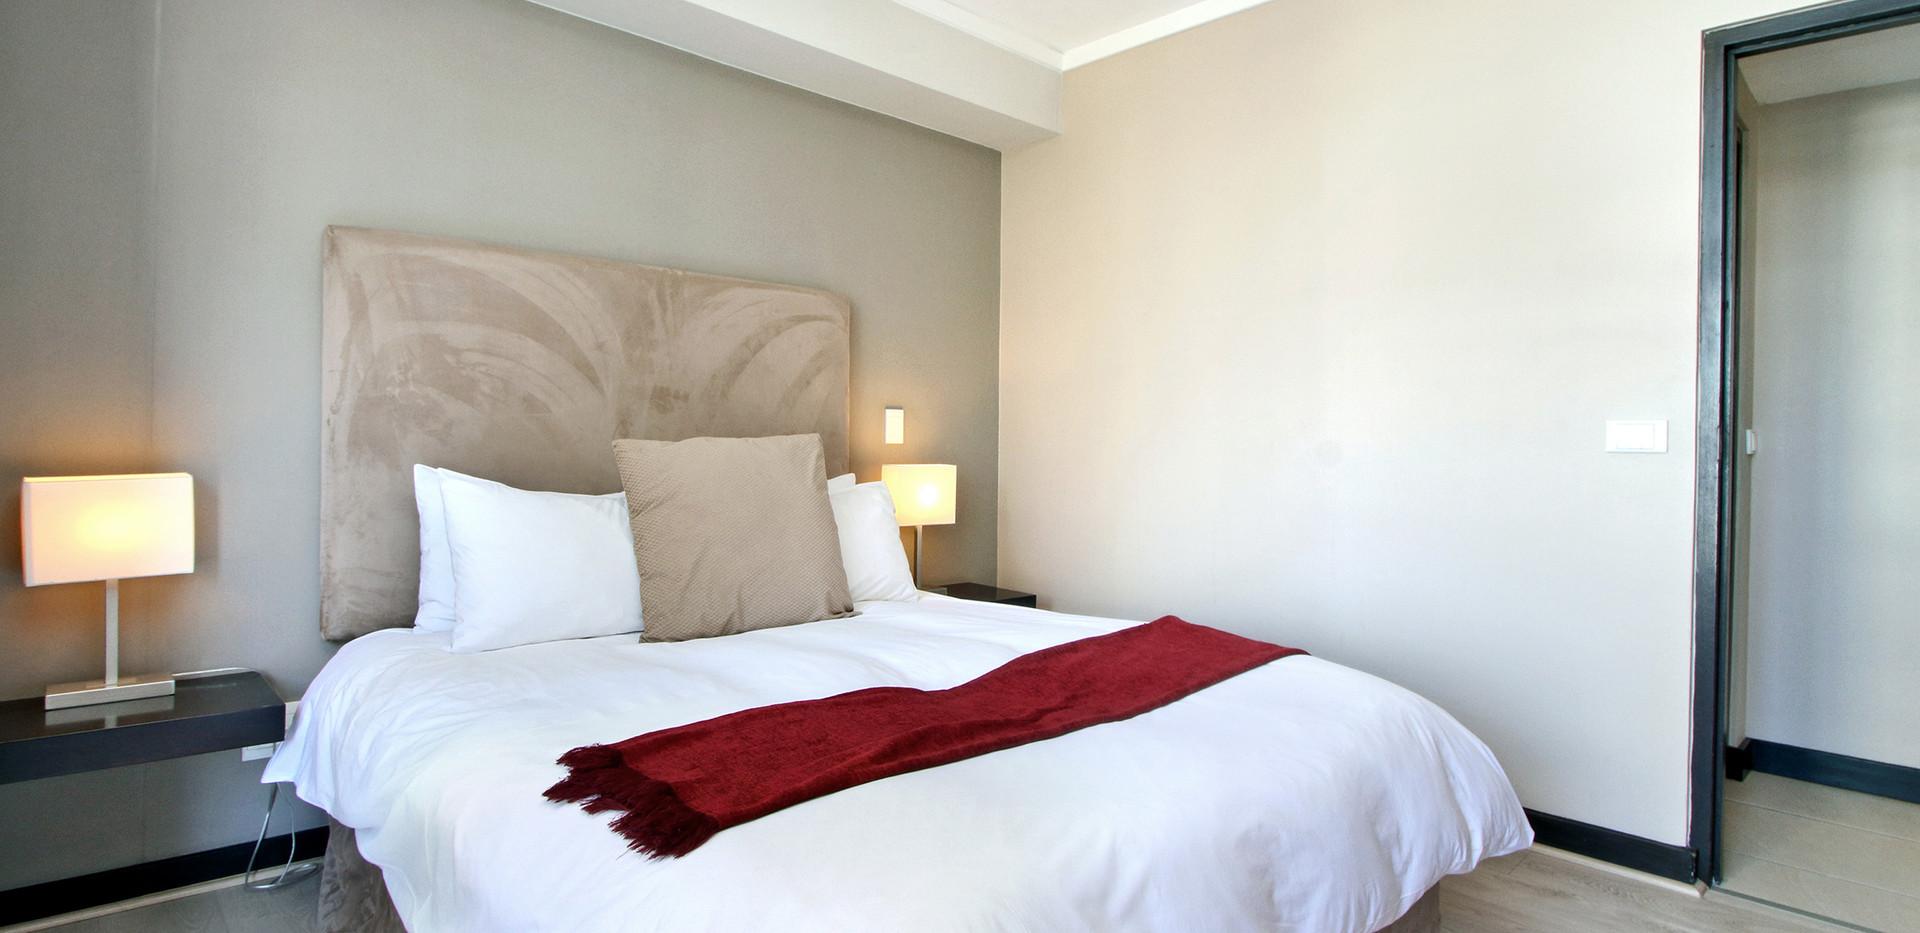 bedroom_1bedroom_Icon_804_ITC_2.jpg